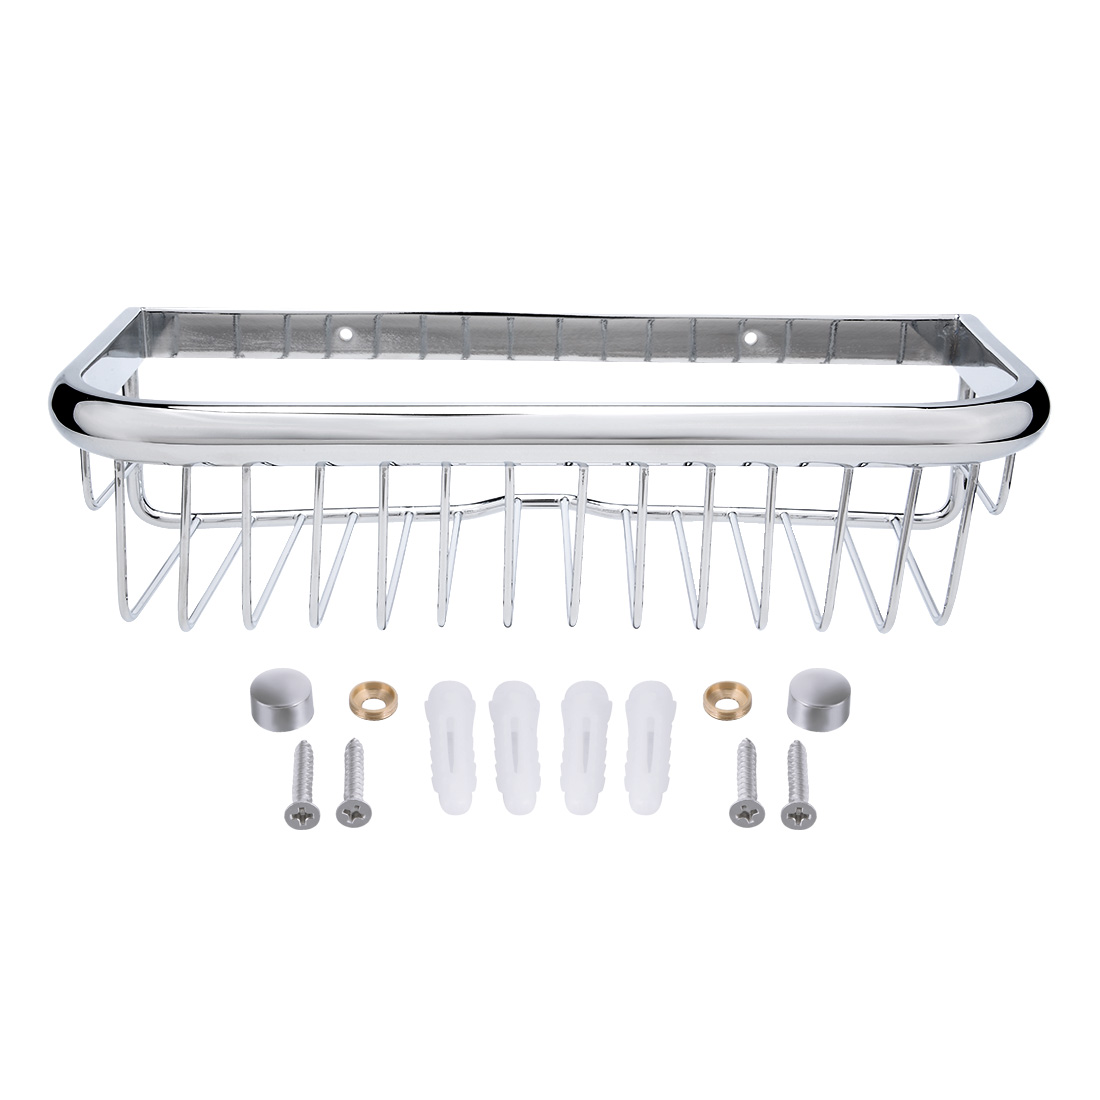 12-inch Length Brass Rectangle Shape Bathroom Shower Caddy Basket Silver Tone